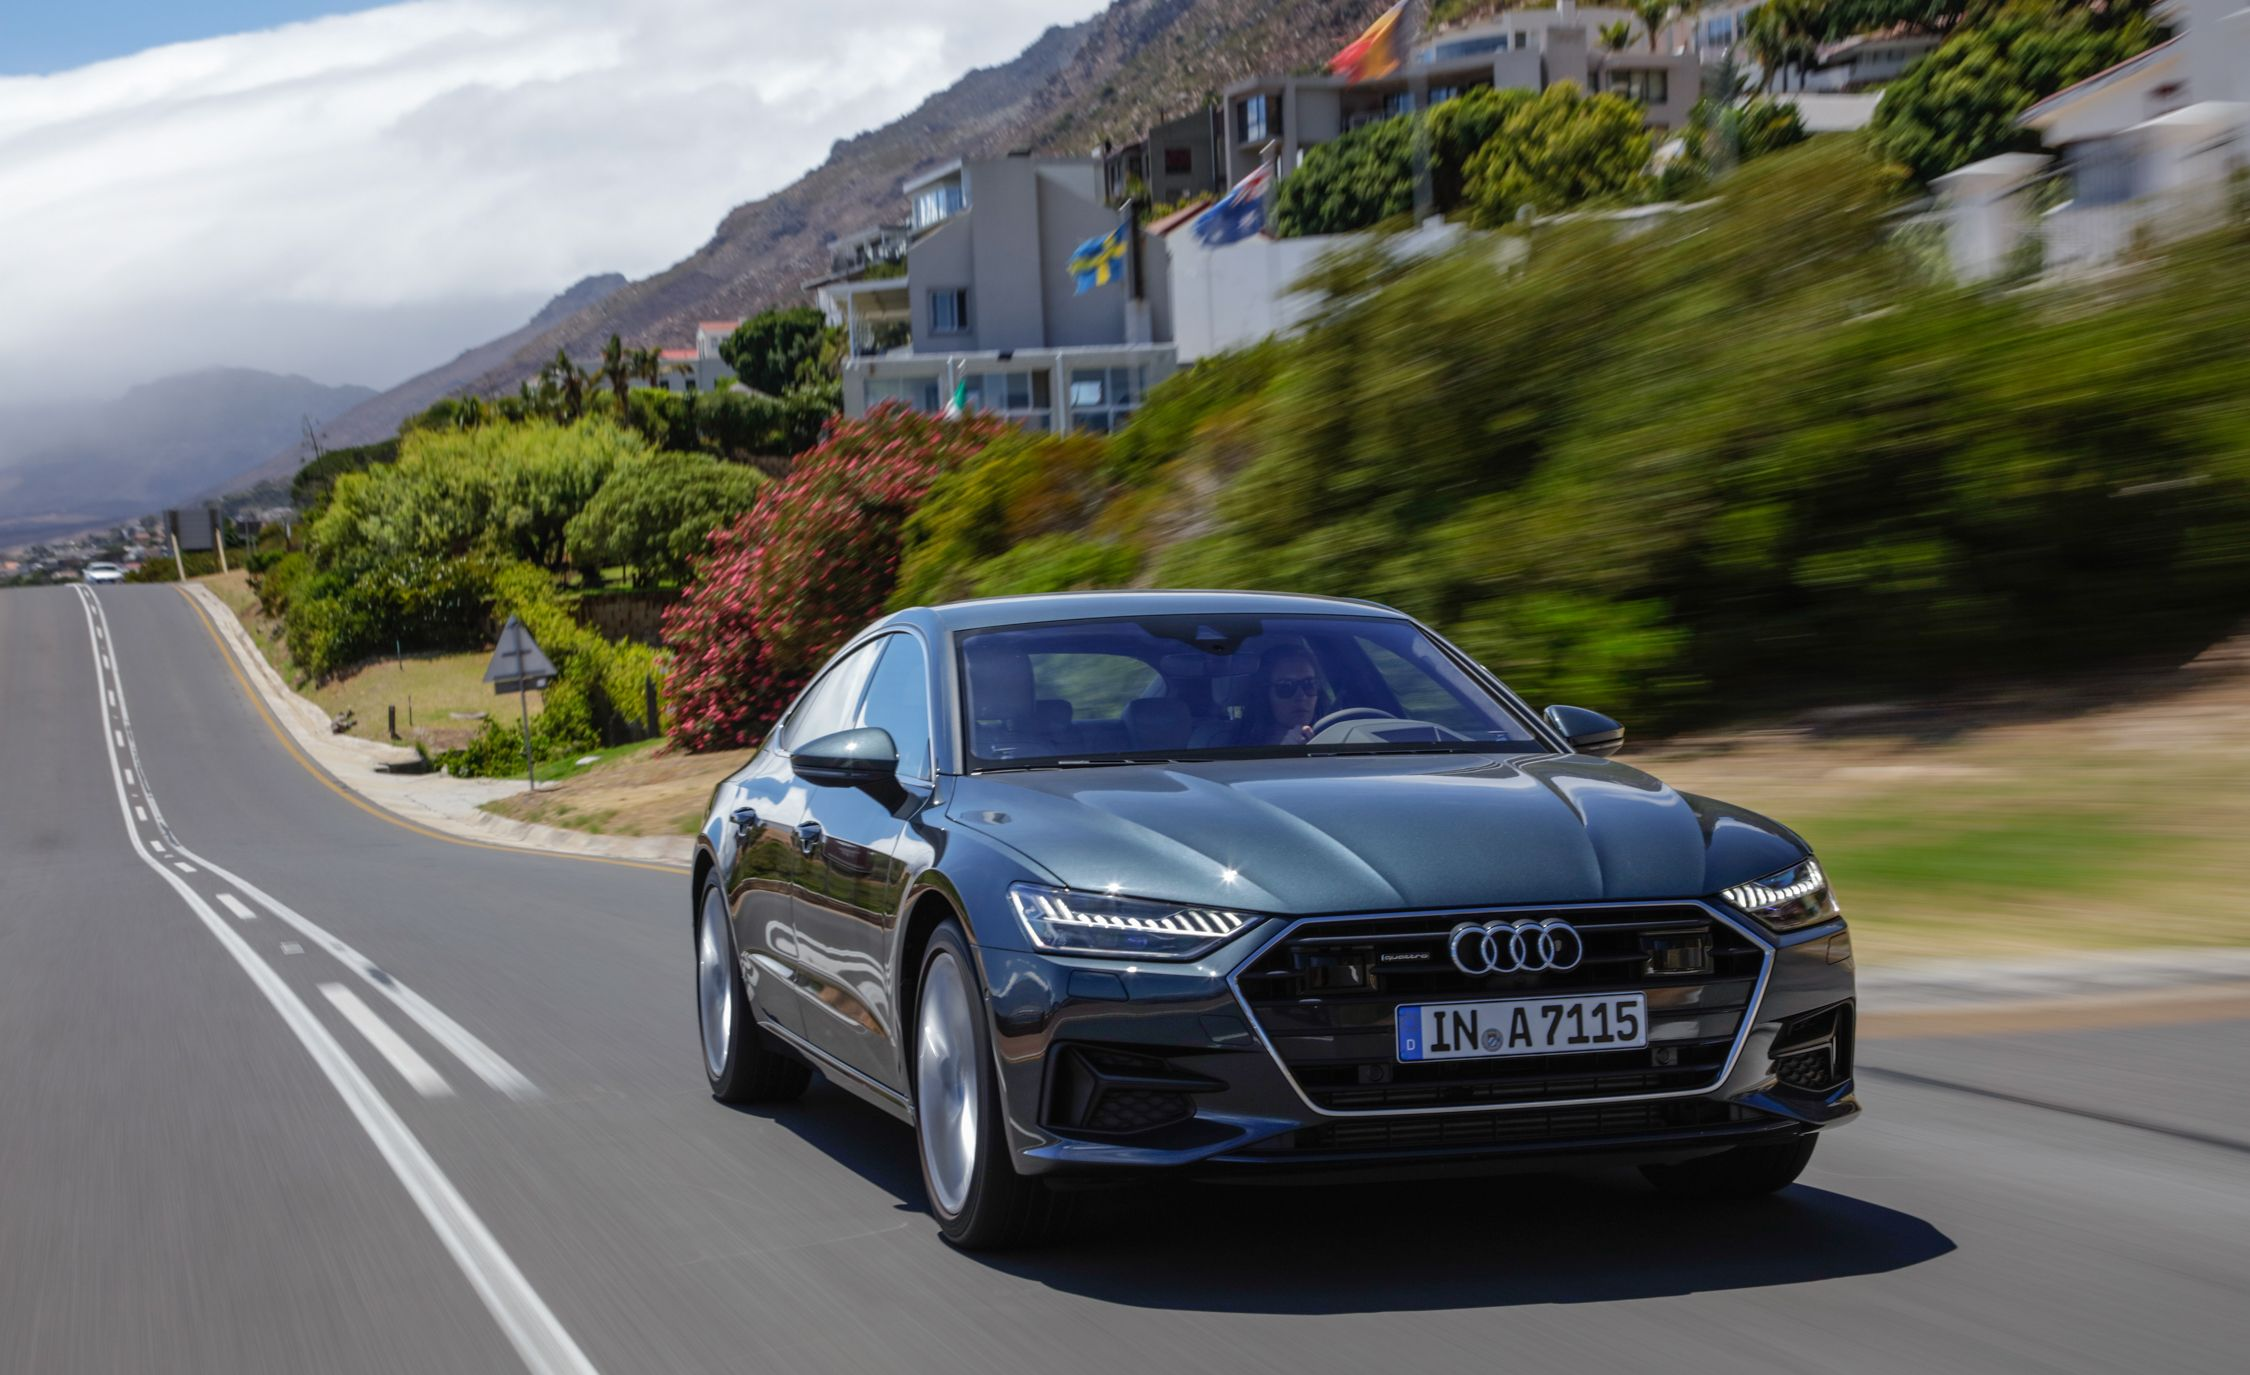 2019-Audi-A7-Sportback-162-1.jpg